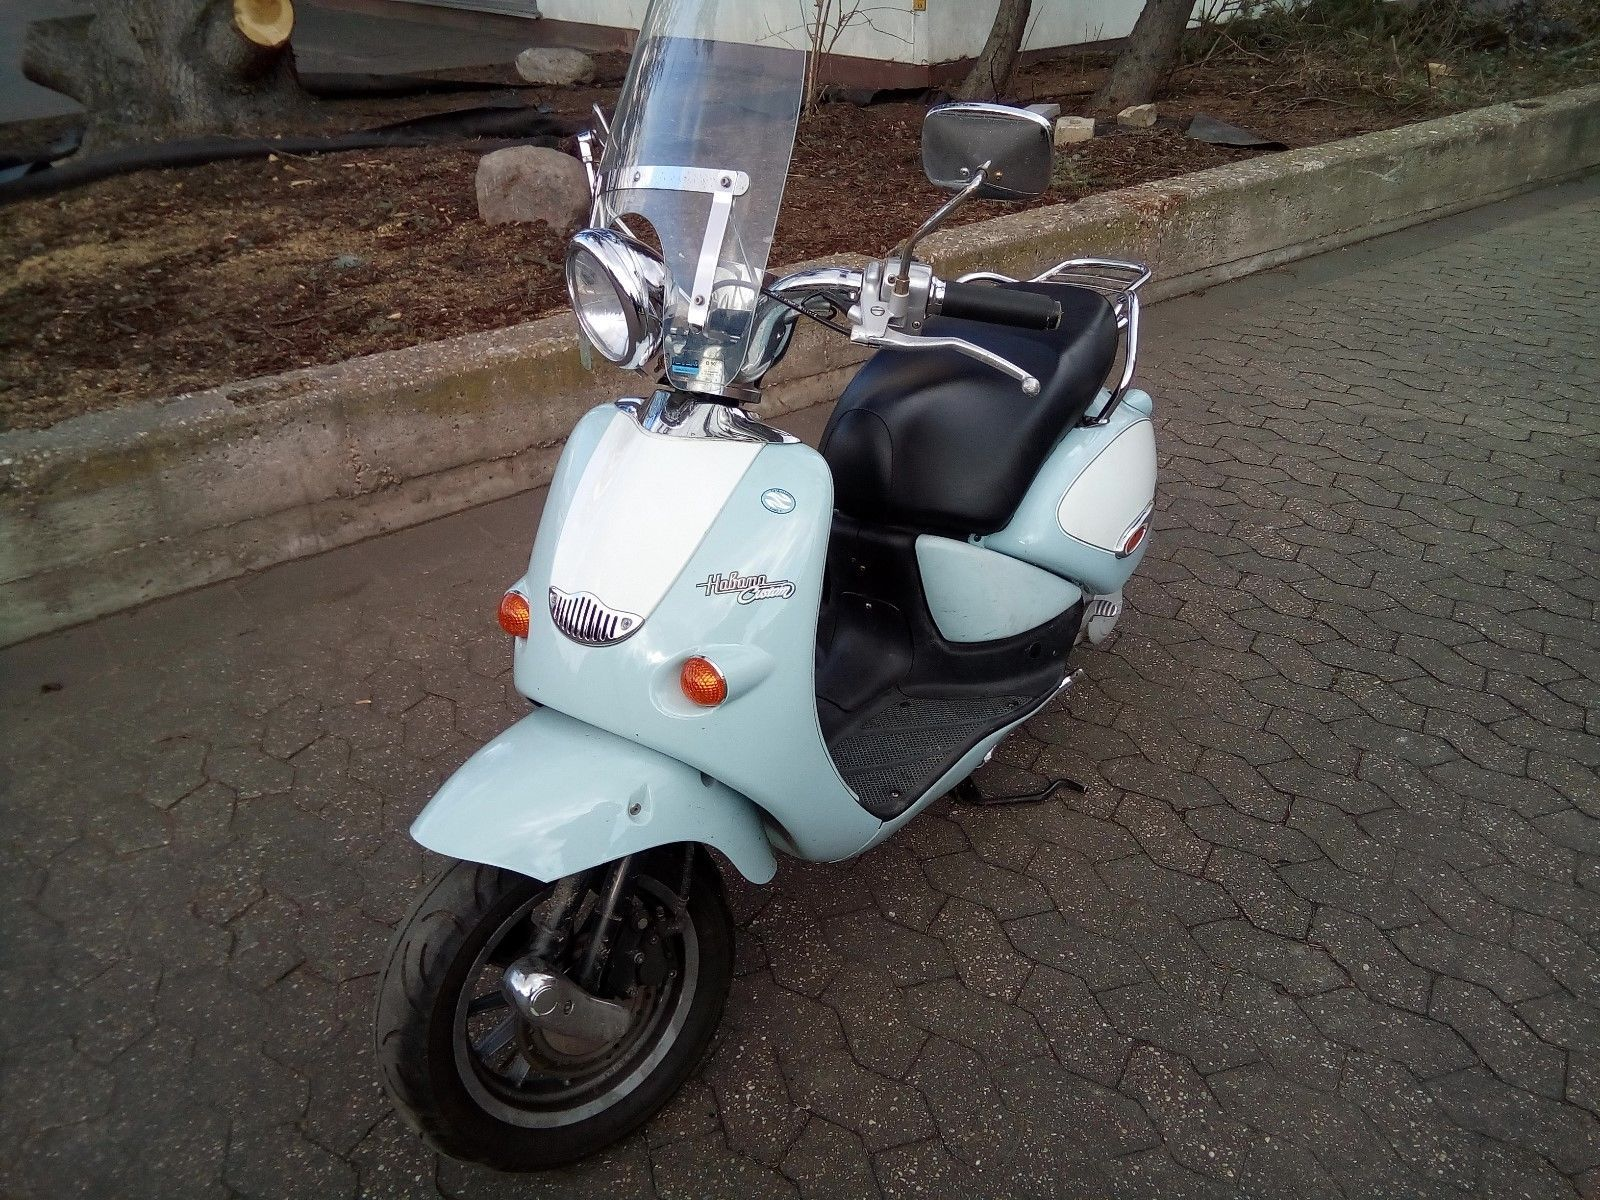 Hadeco Glas Design Glasturen Und Glastechnik Made In Germany Aprilia Motorcycle Moped